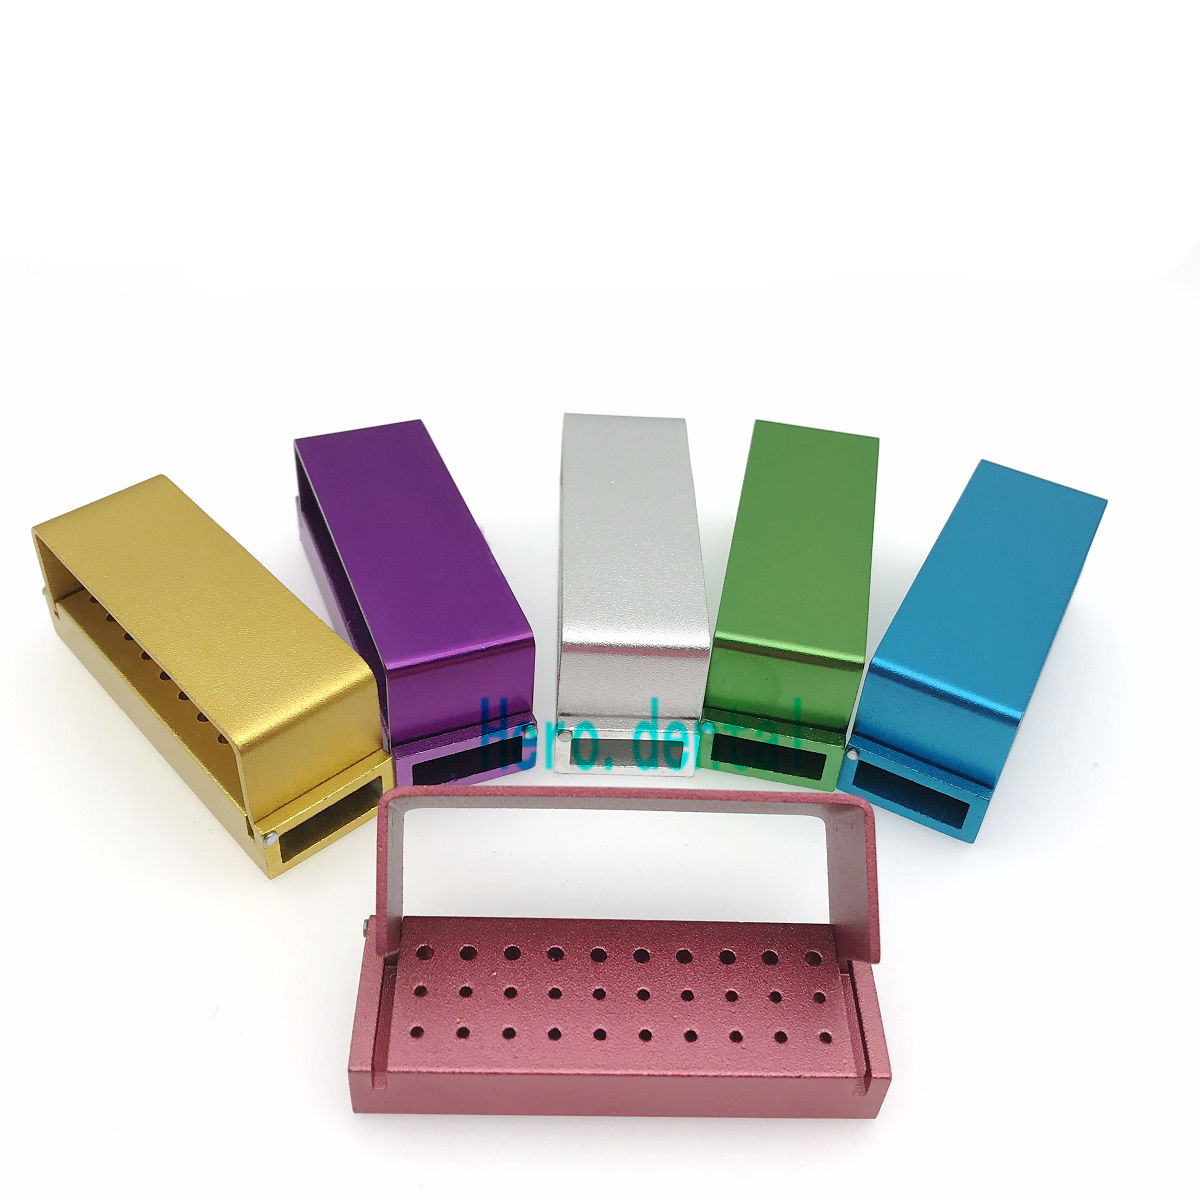 30Holes ALUMINIUM Dental Bur Burs Holder Block Dental Disinfection Box Autoclave